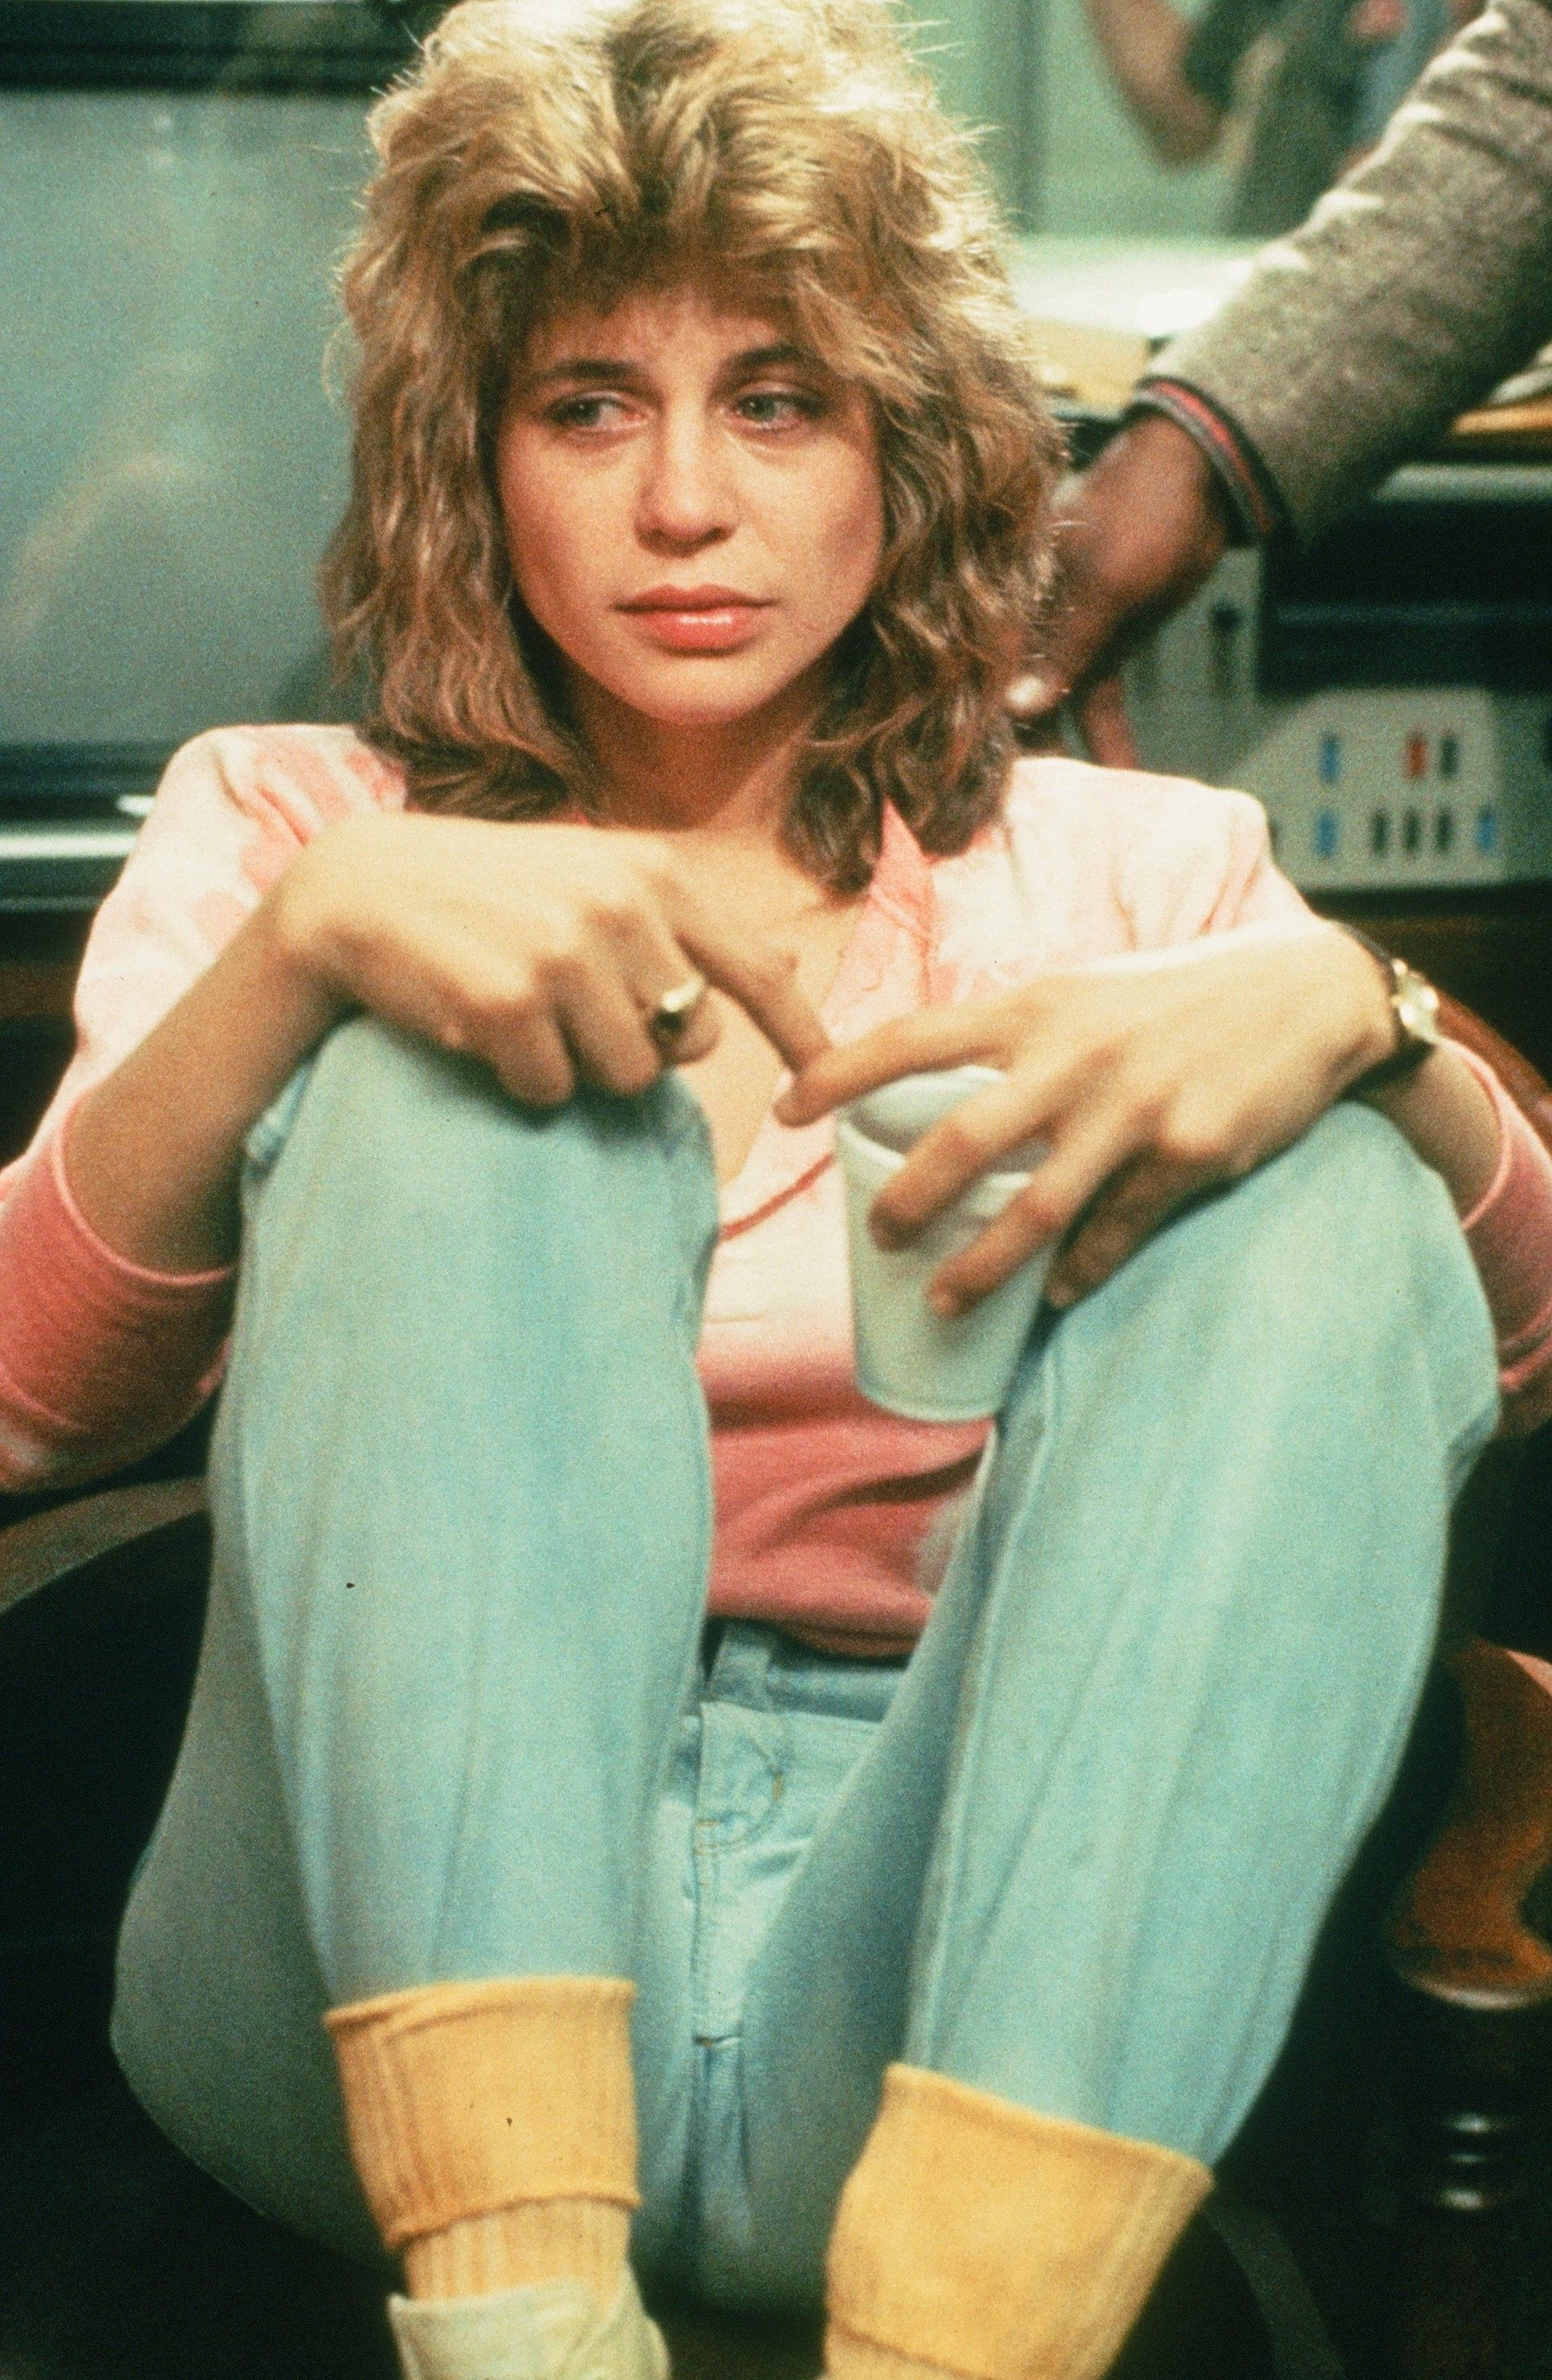 The Terminator (1984) Linda Hamilton as Sarah Connor in